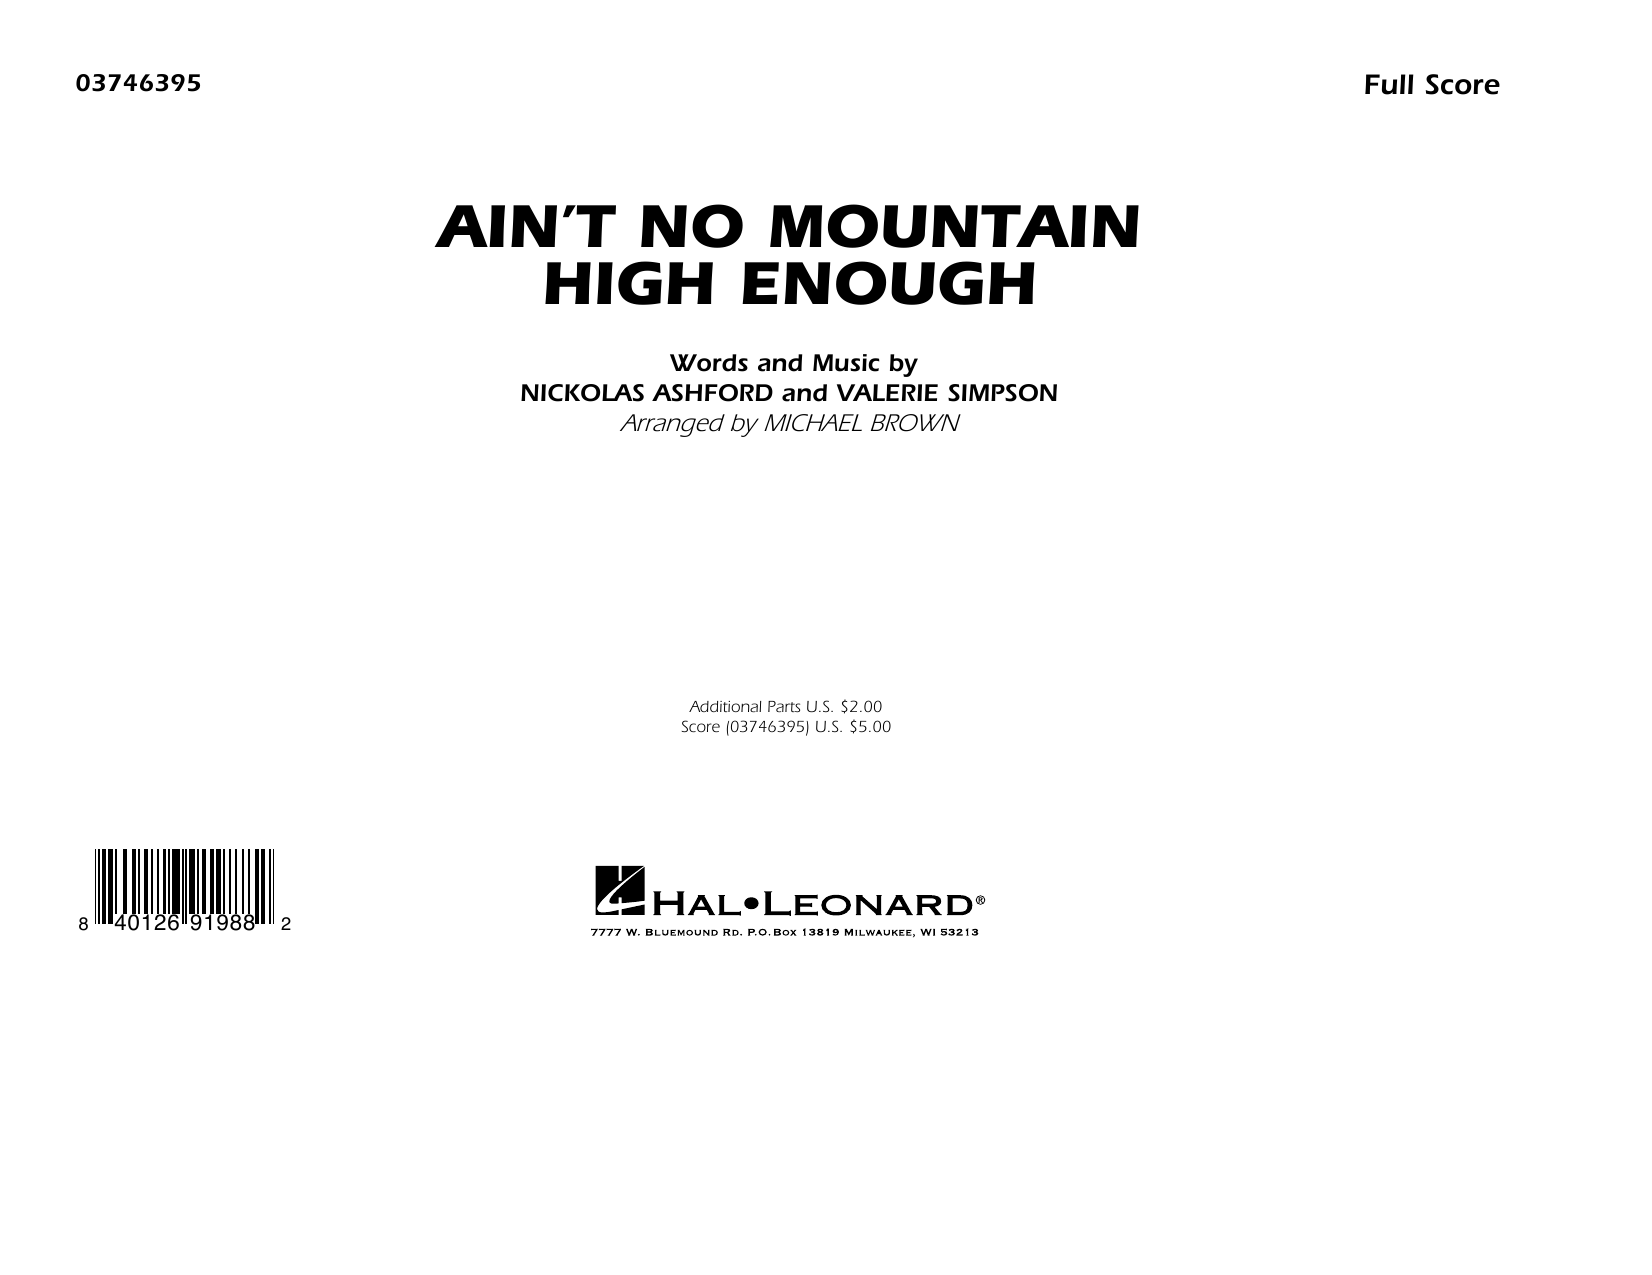 Ain't No Mountain High Enough (arr. Michael Brown) - Conductor Score (Full Score) Sheet Music